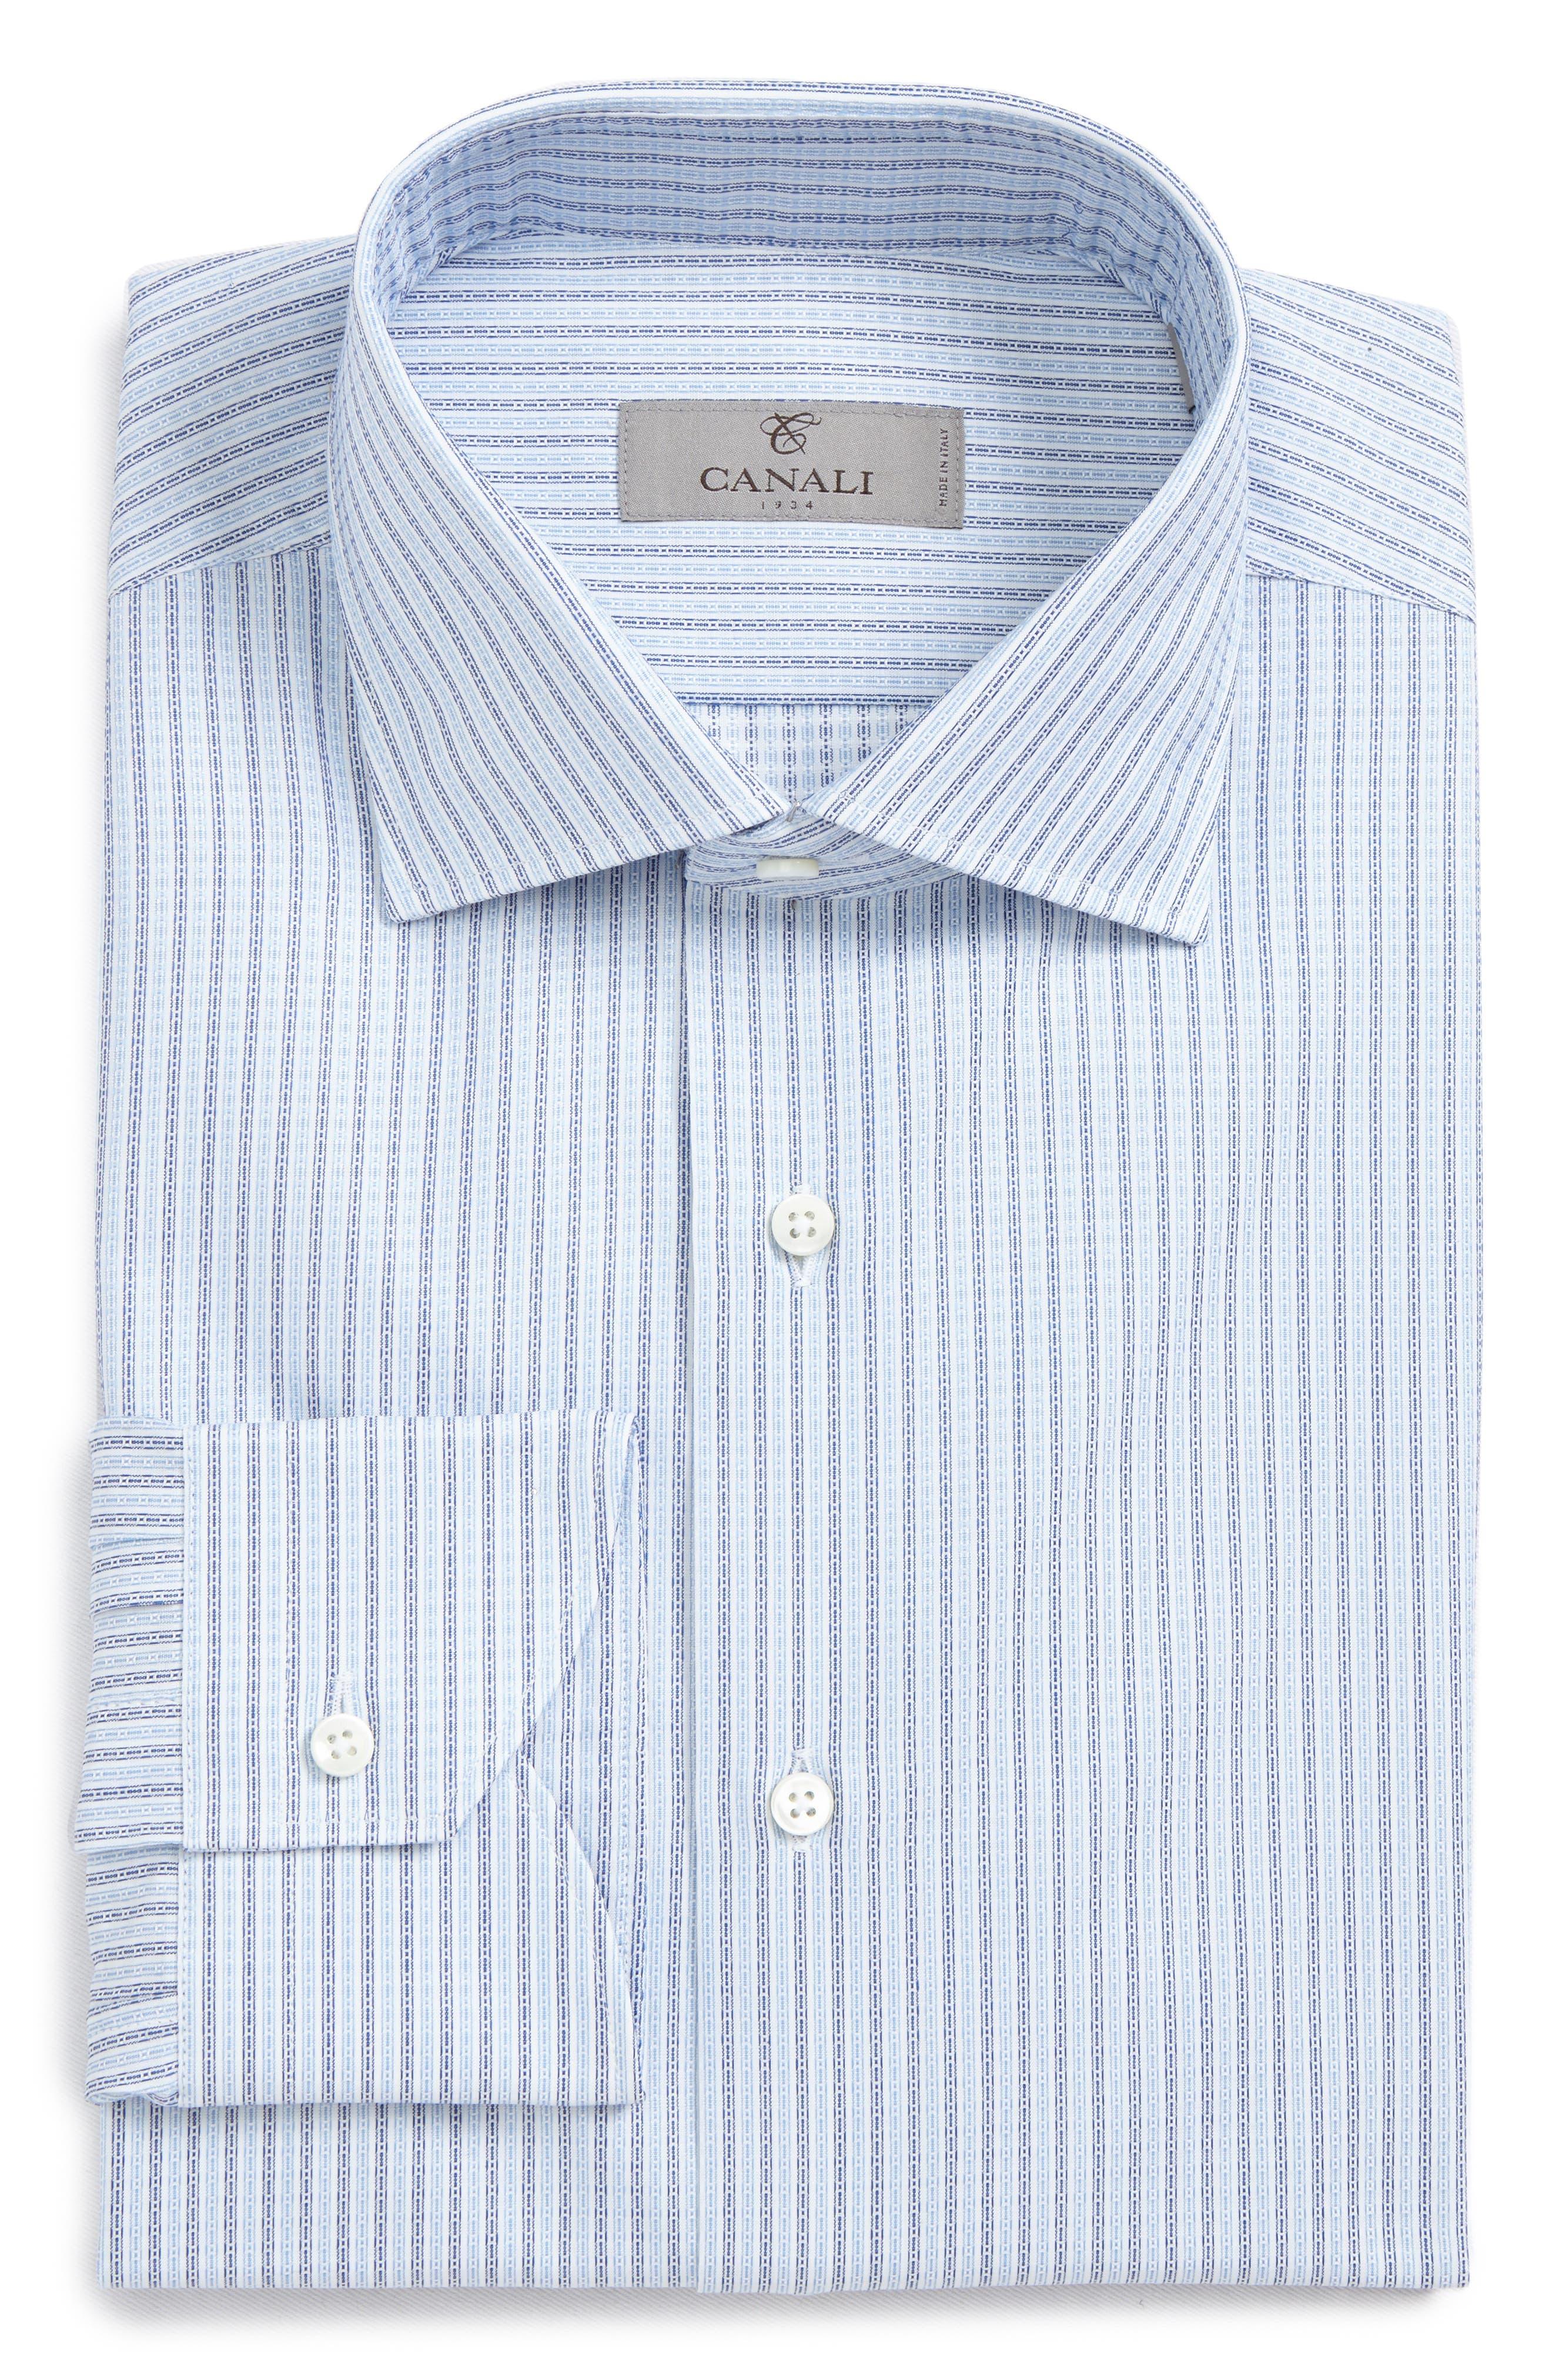 Regular Fit Geometric Dress Shirt,                             Main thumbnail 1, color,                             420